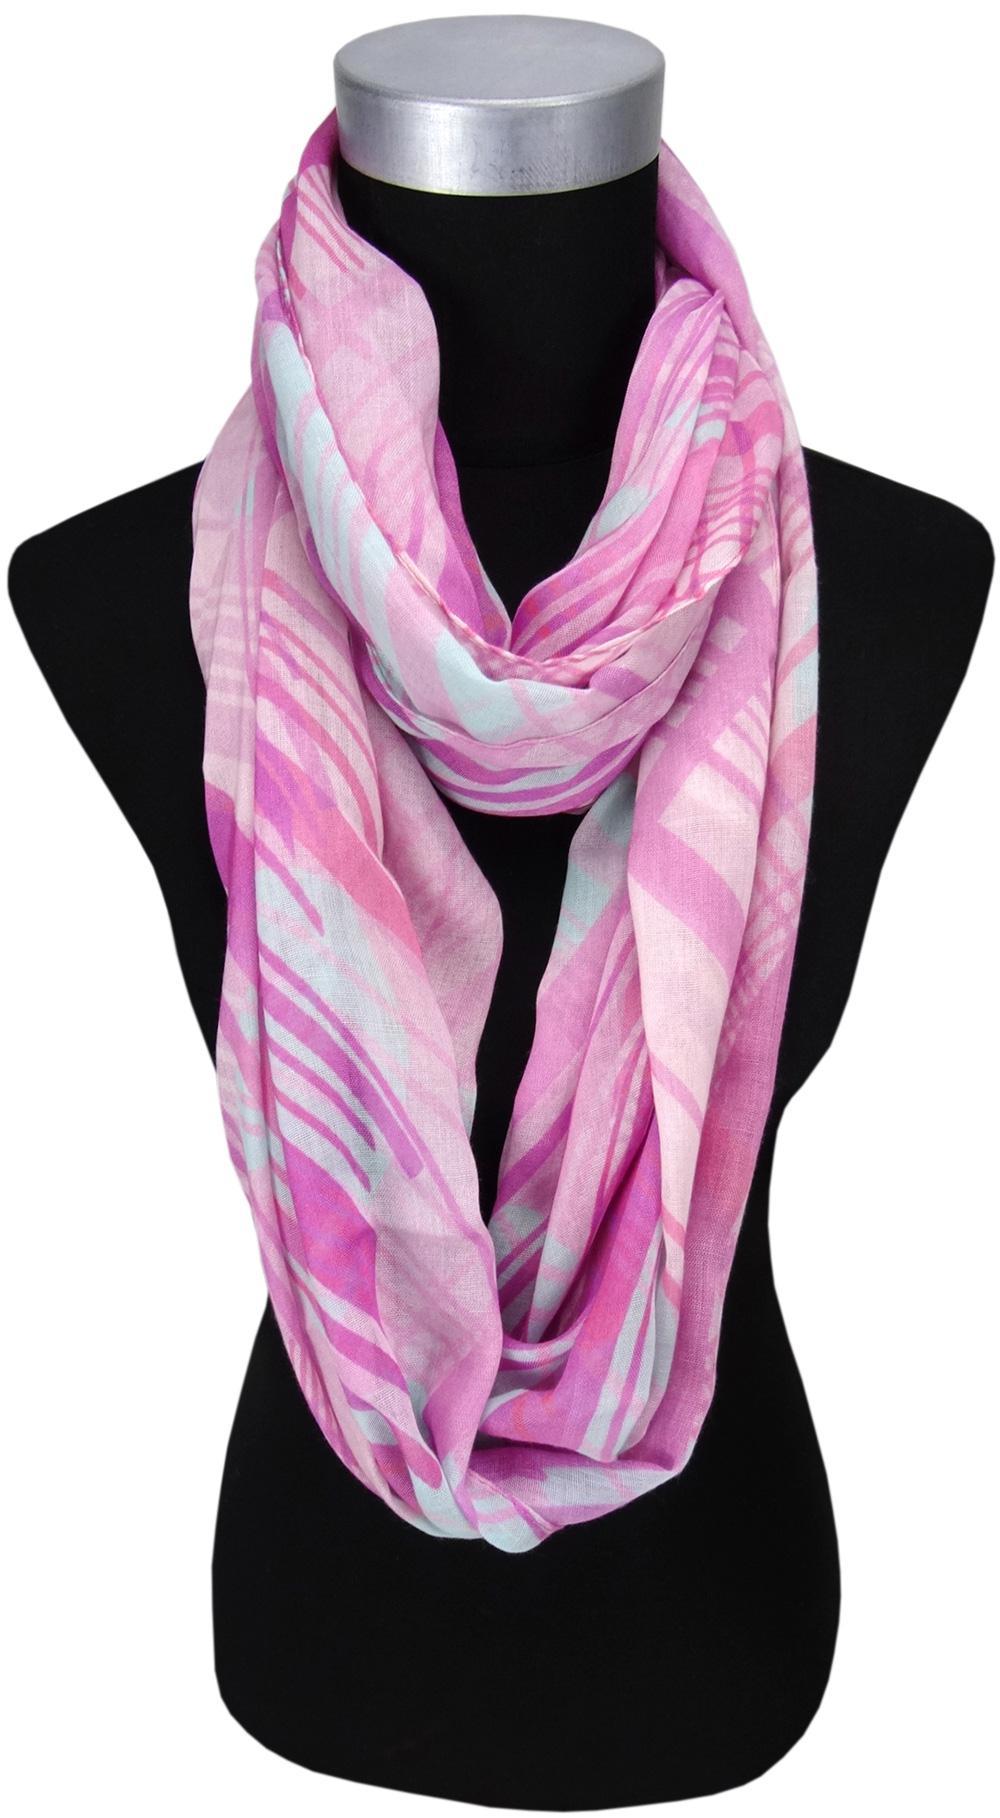 b12778d14177 TigerTie Chiffon Loop Schal in rosa pink grau gemustert - Gr. 180 x 70 cm